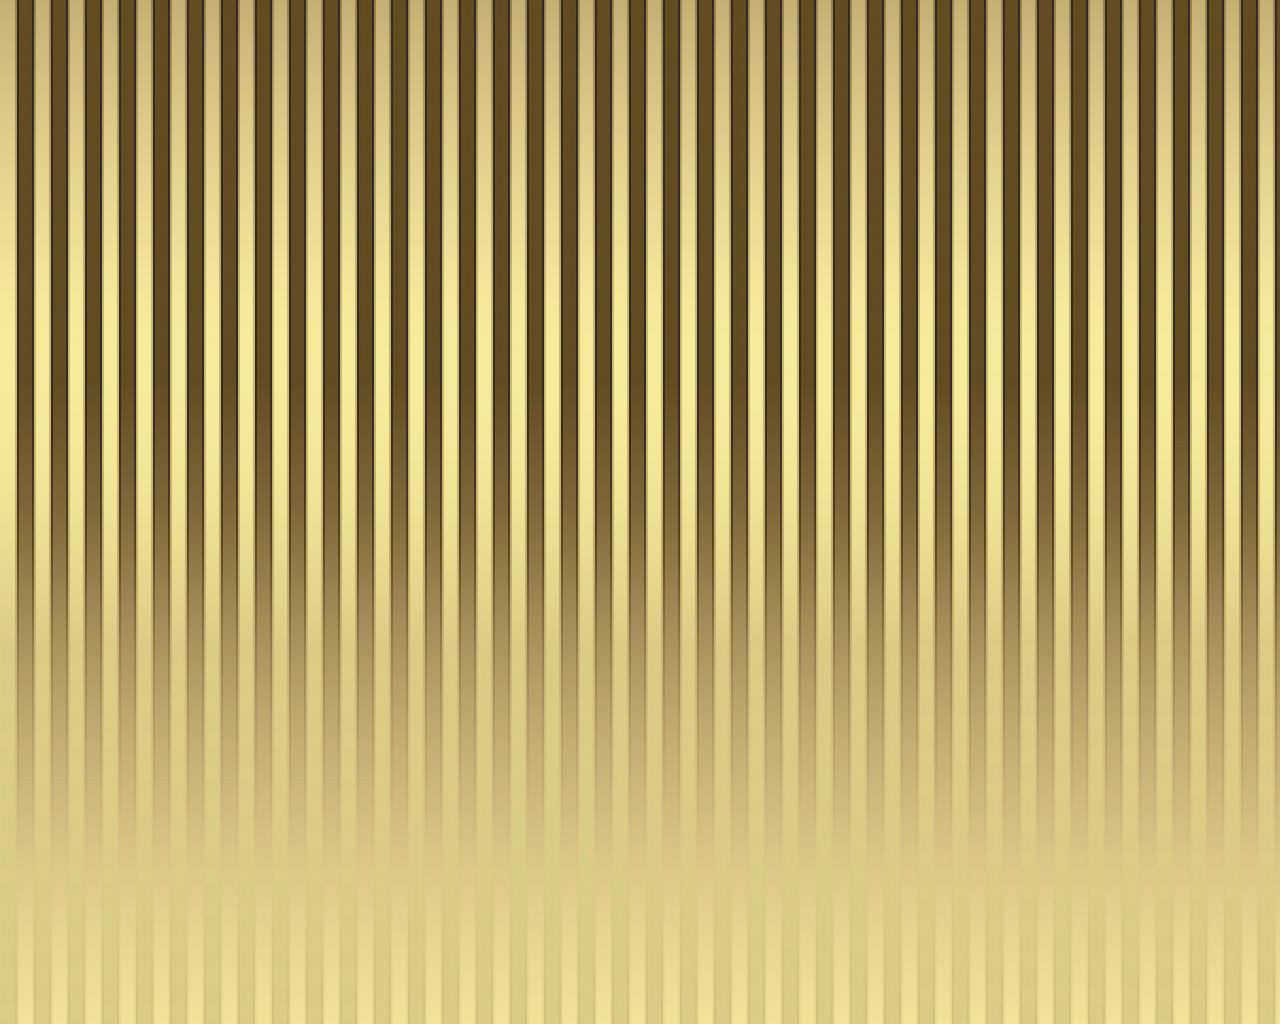 Wallpaper Stripes Design : Sh yn design stripe wallpaper gold